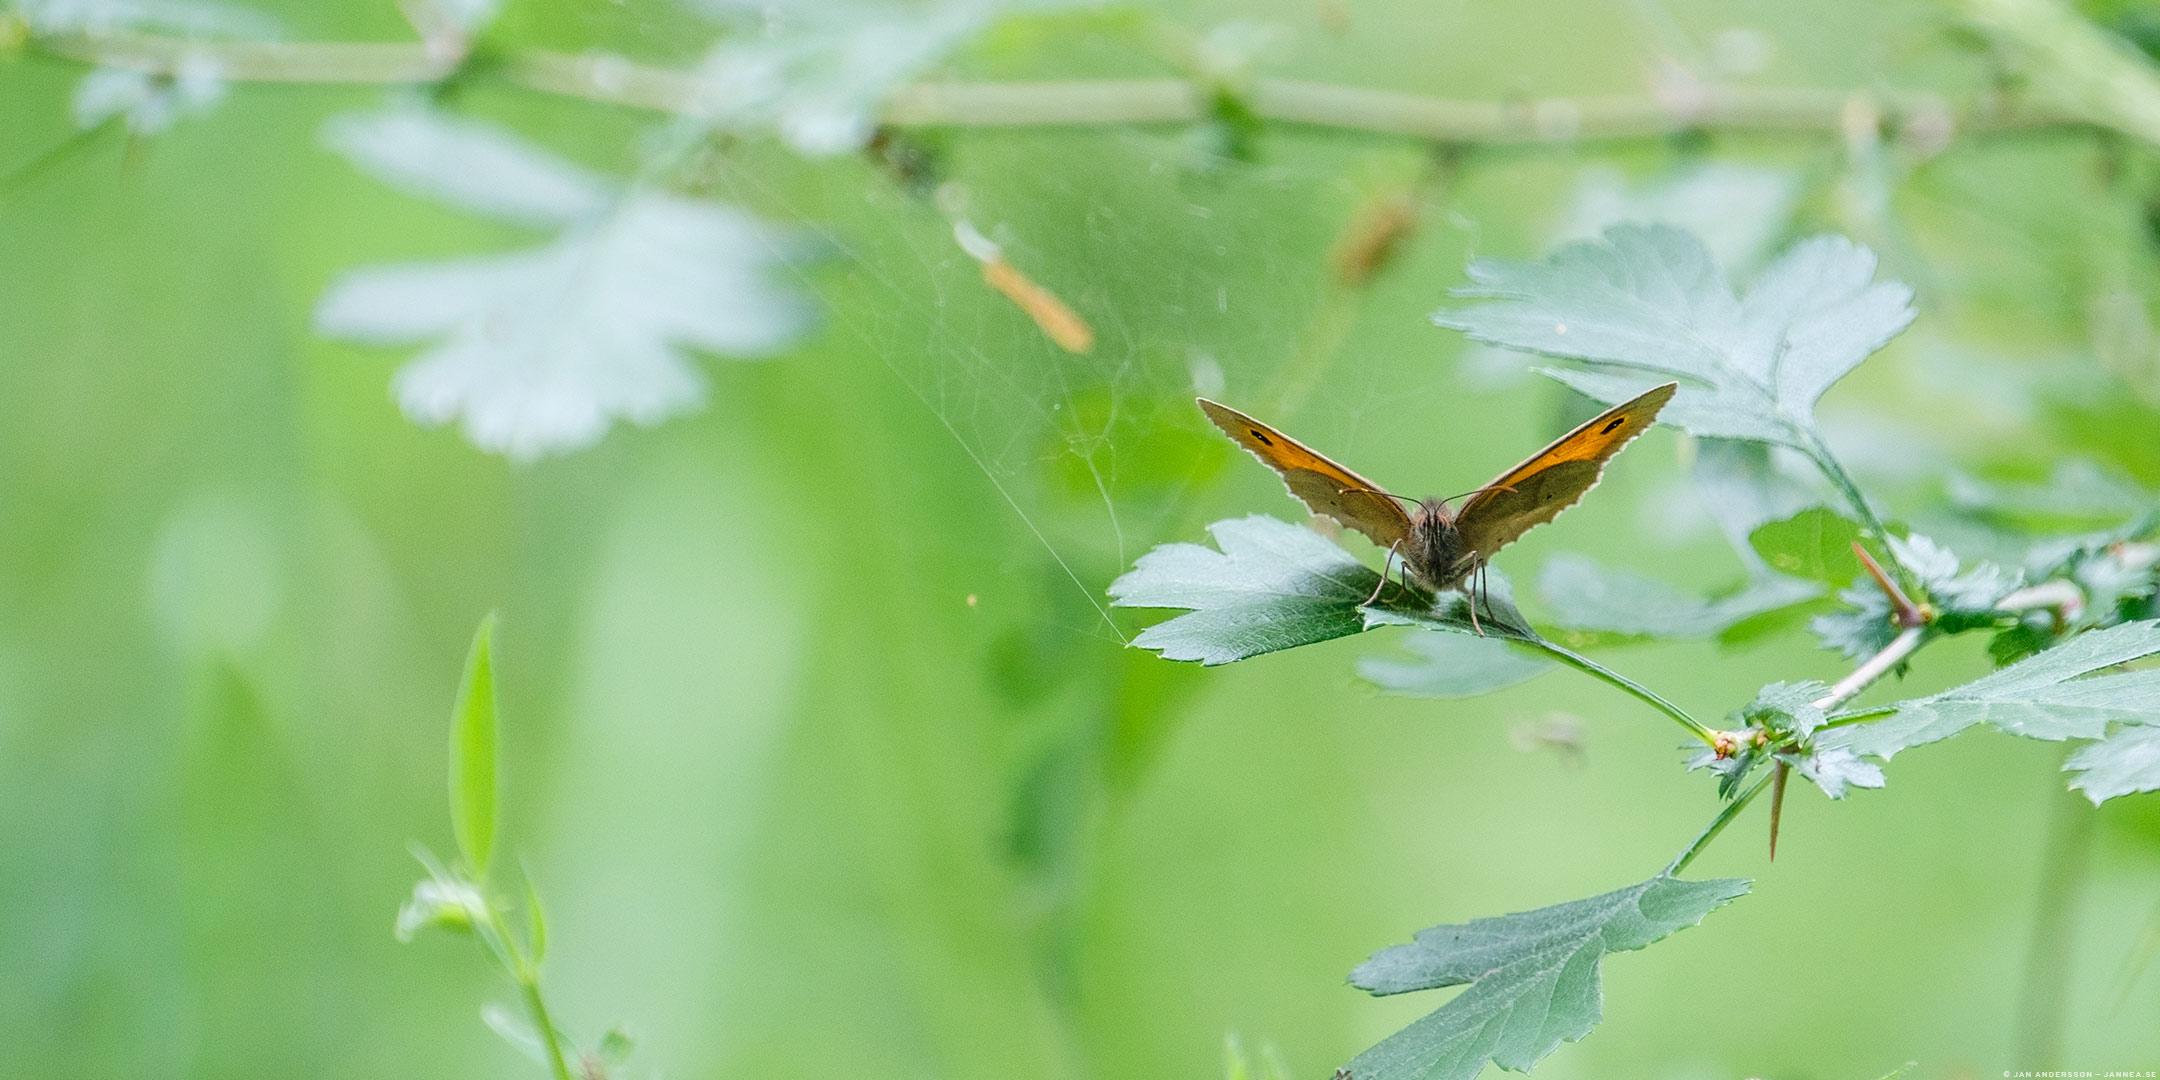 Irriterande insektsjävlar